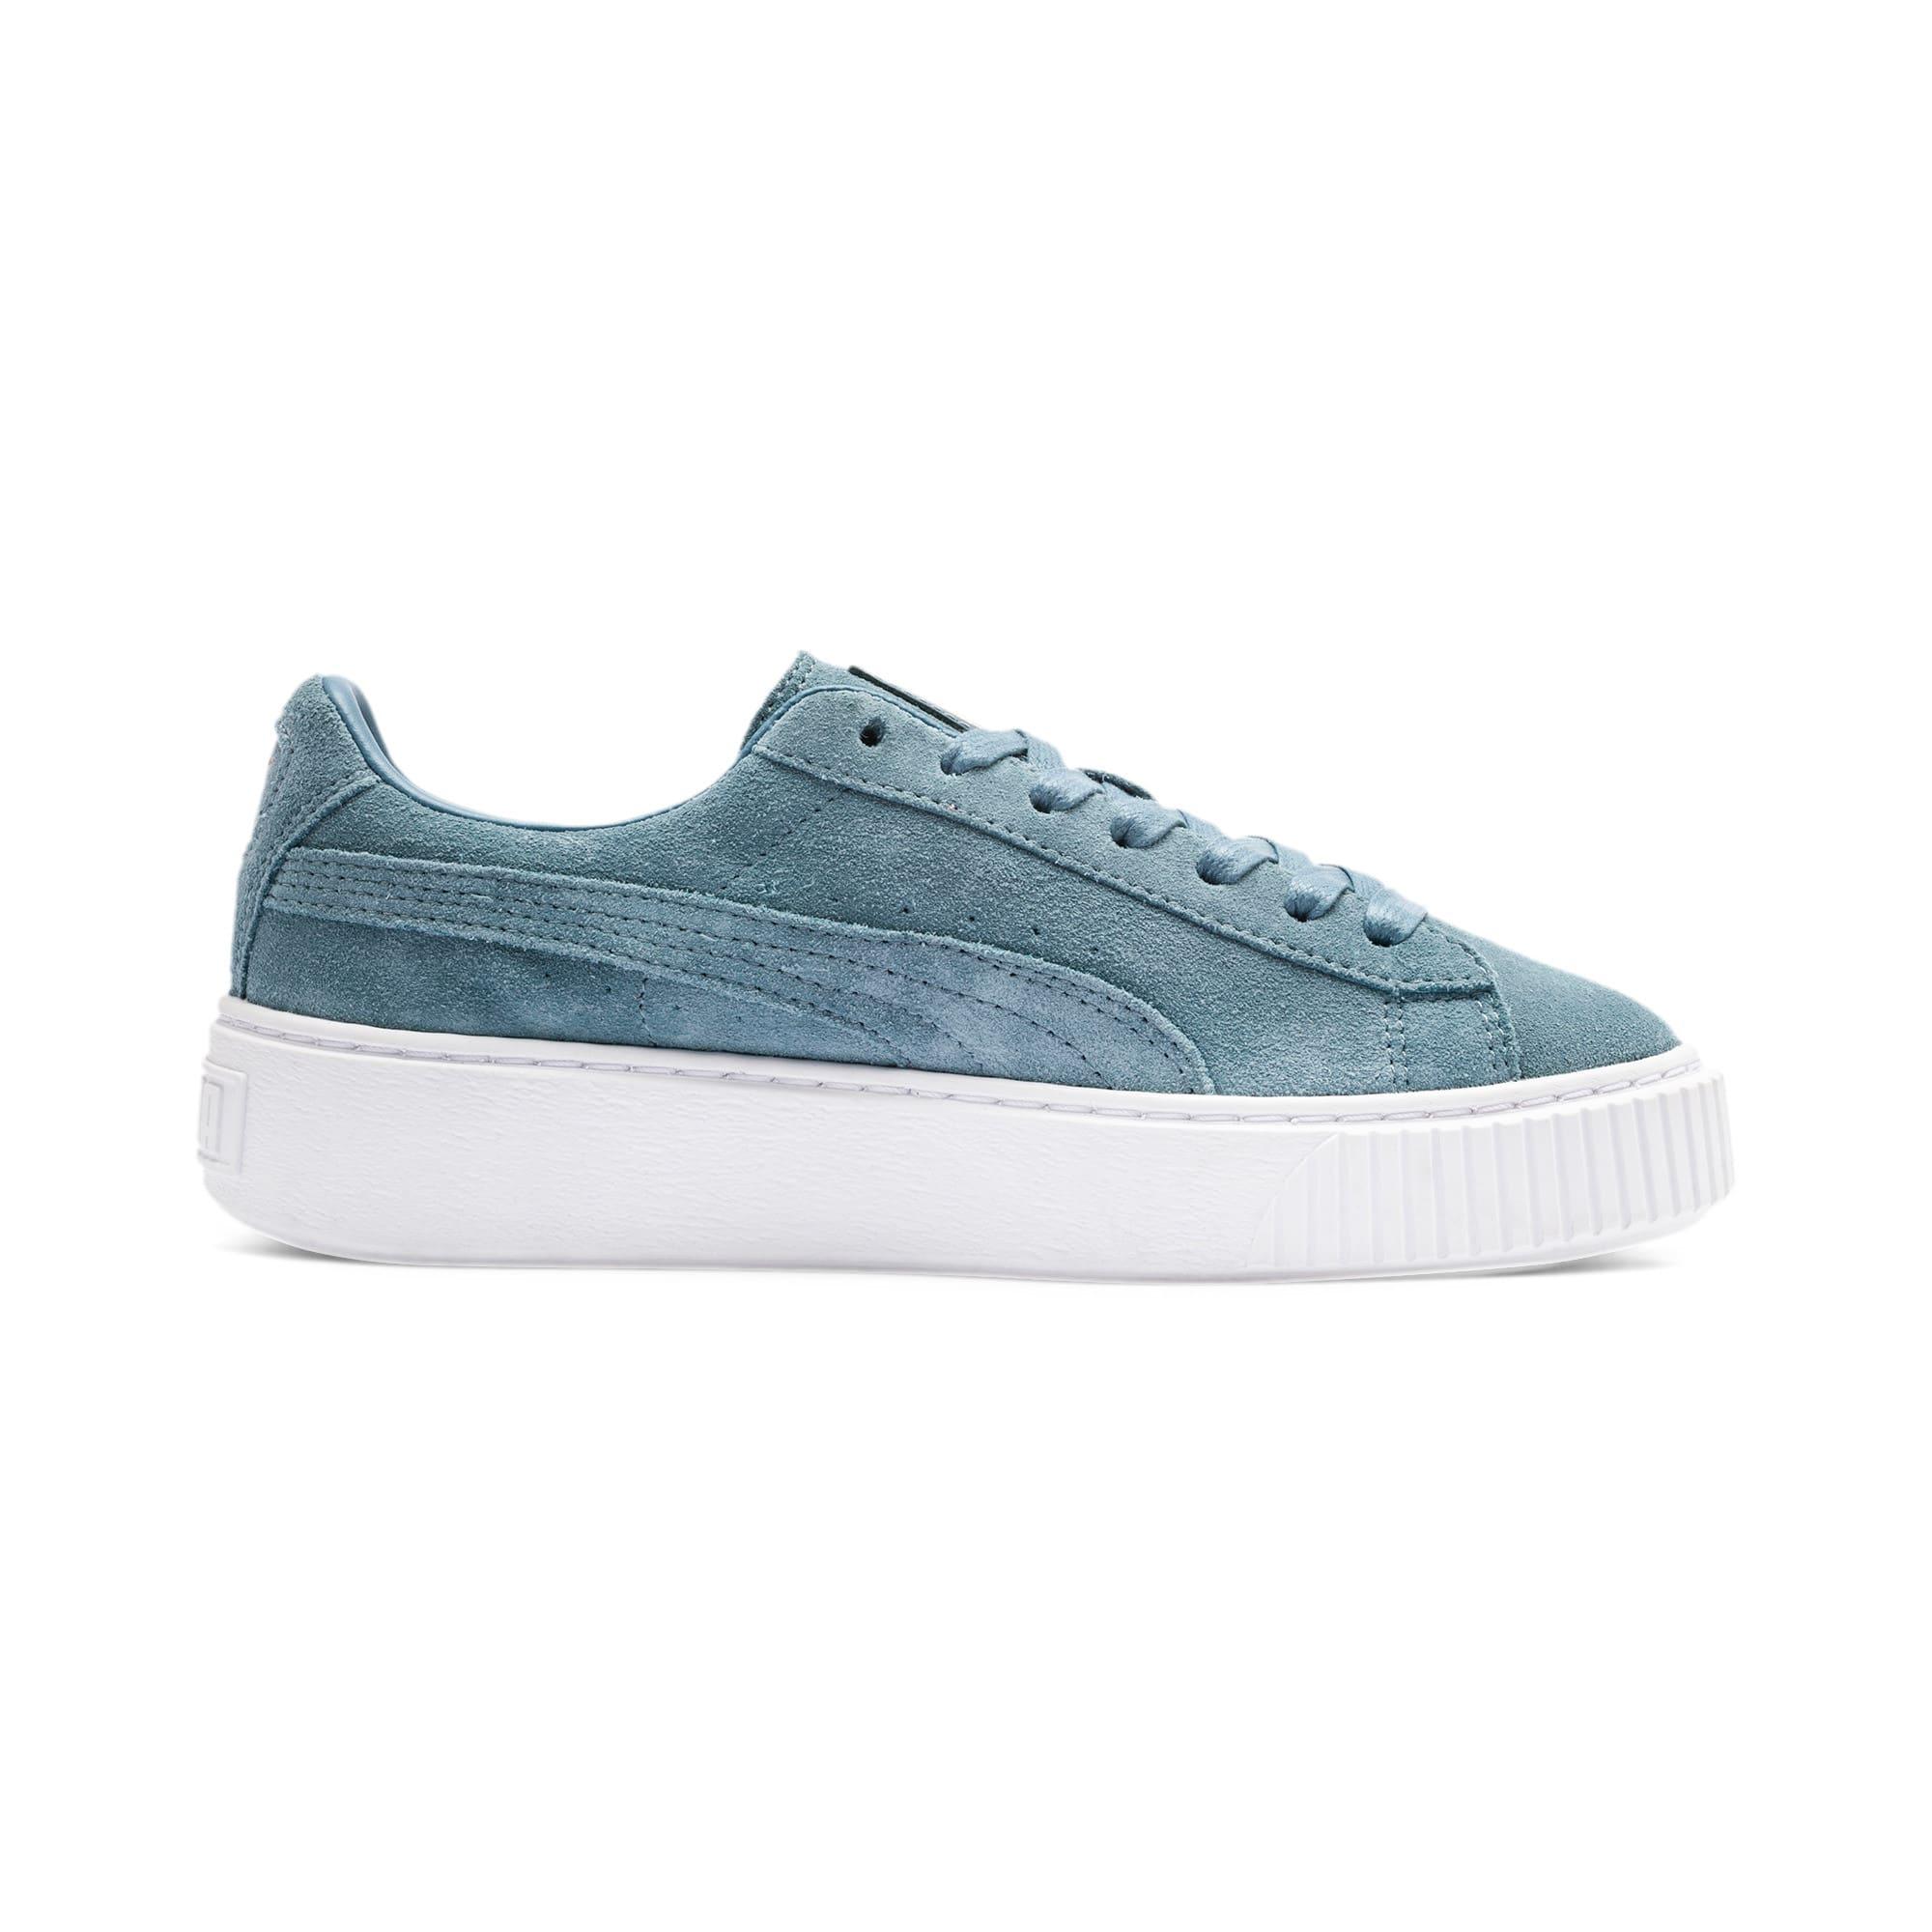 Thumbnail 6 of Suede Platform Women's Sneakers, Bluestone-Puma Team Gold, medium